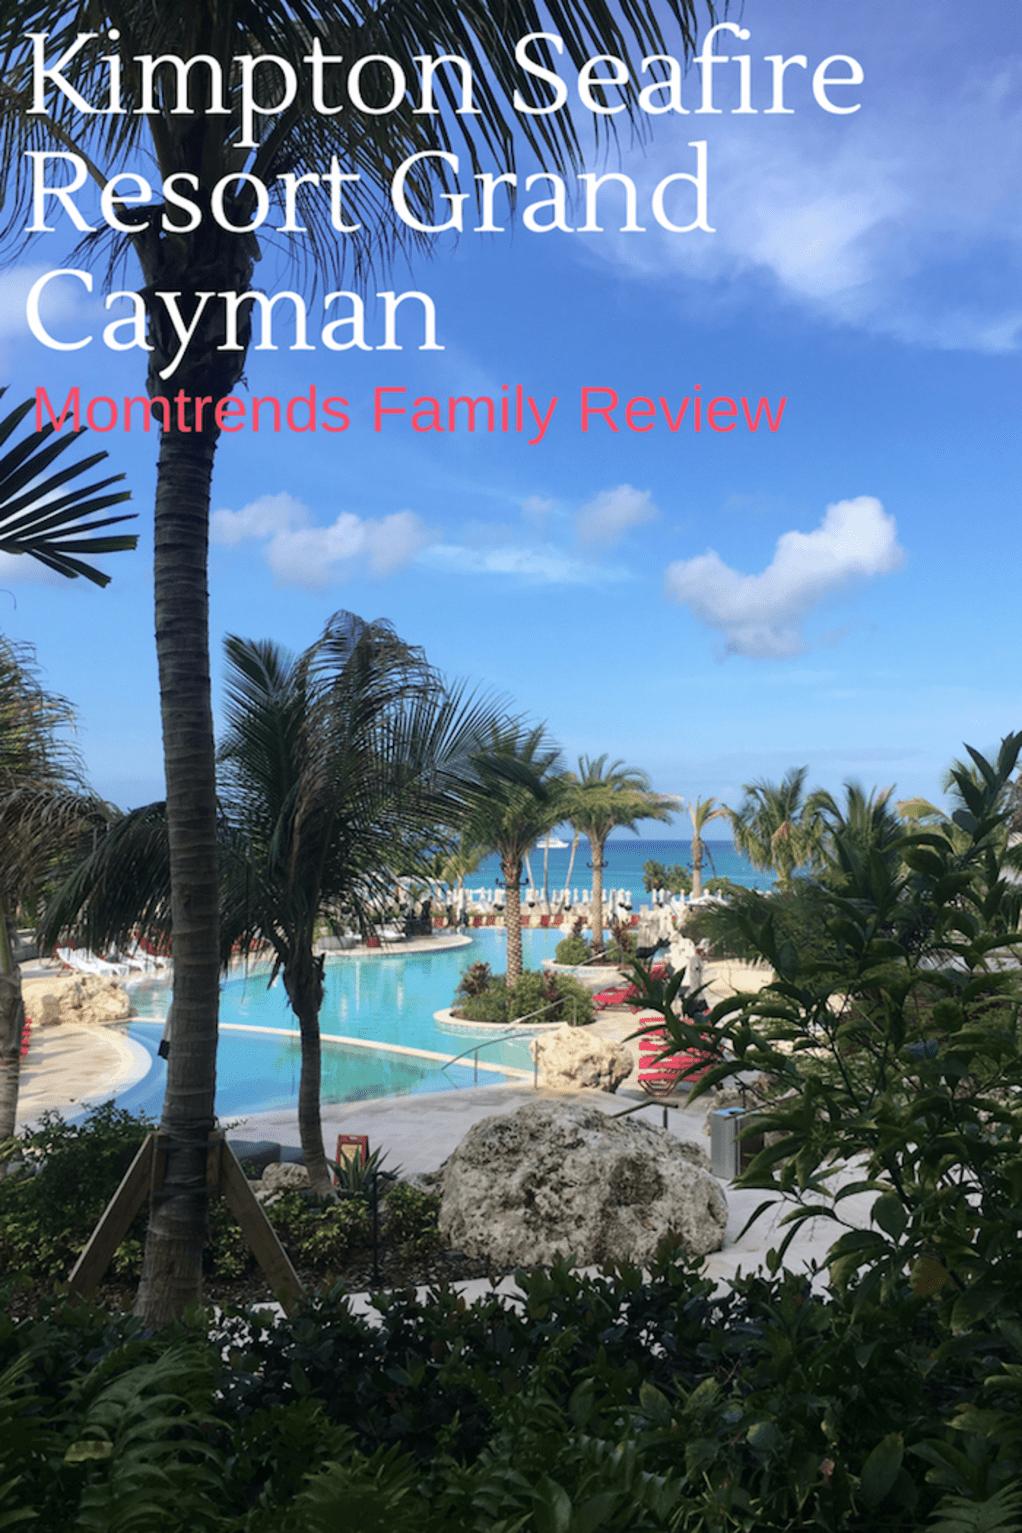 Top 5 Grand Cayman All Inclusive Resorts: Kimpton Seafire Resort Grand Cayman